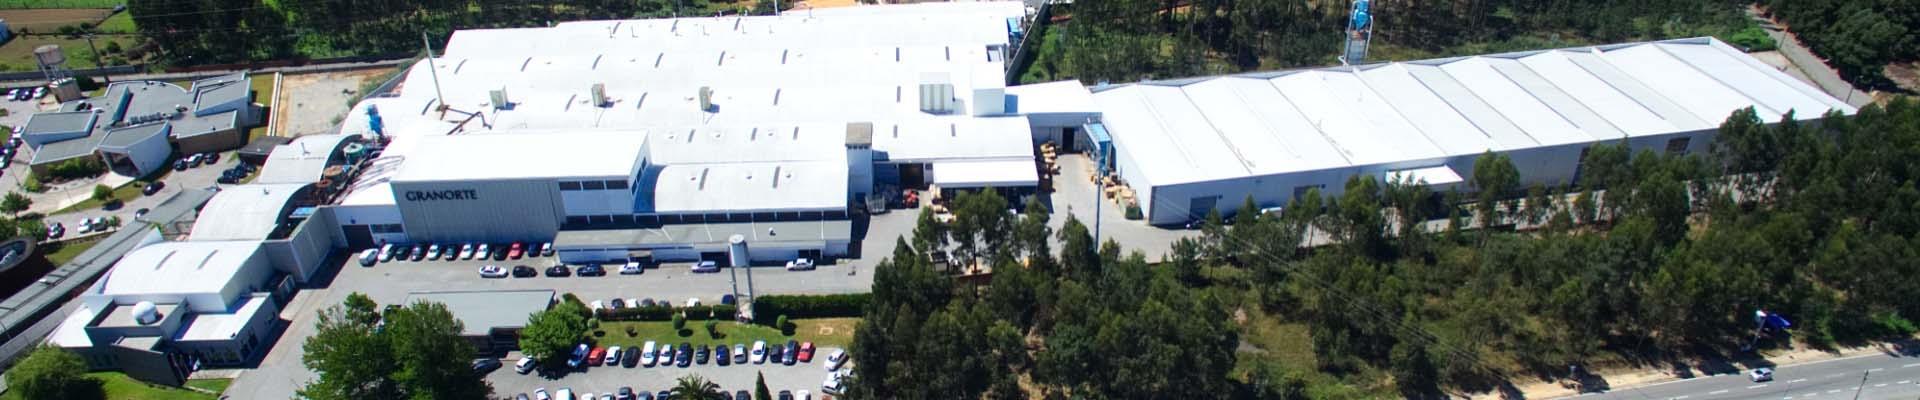 Granorte Factory